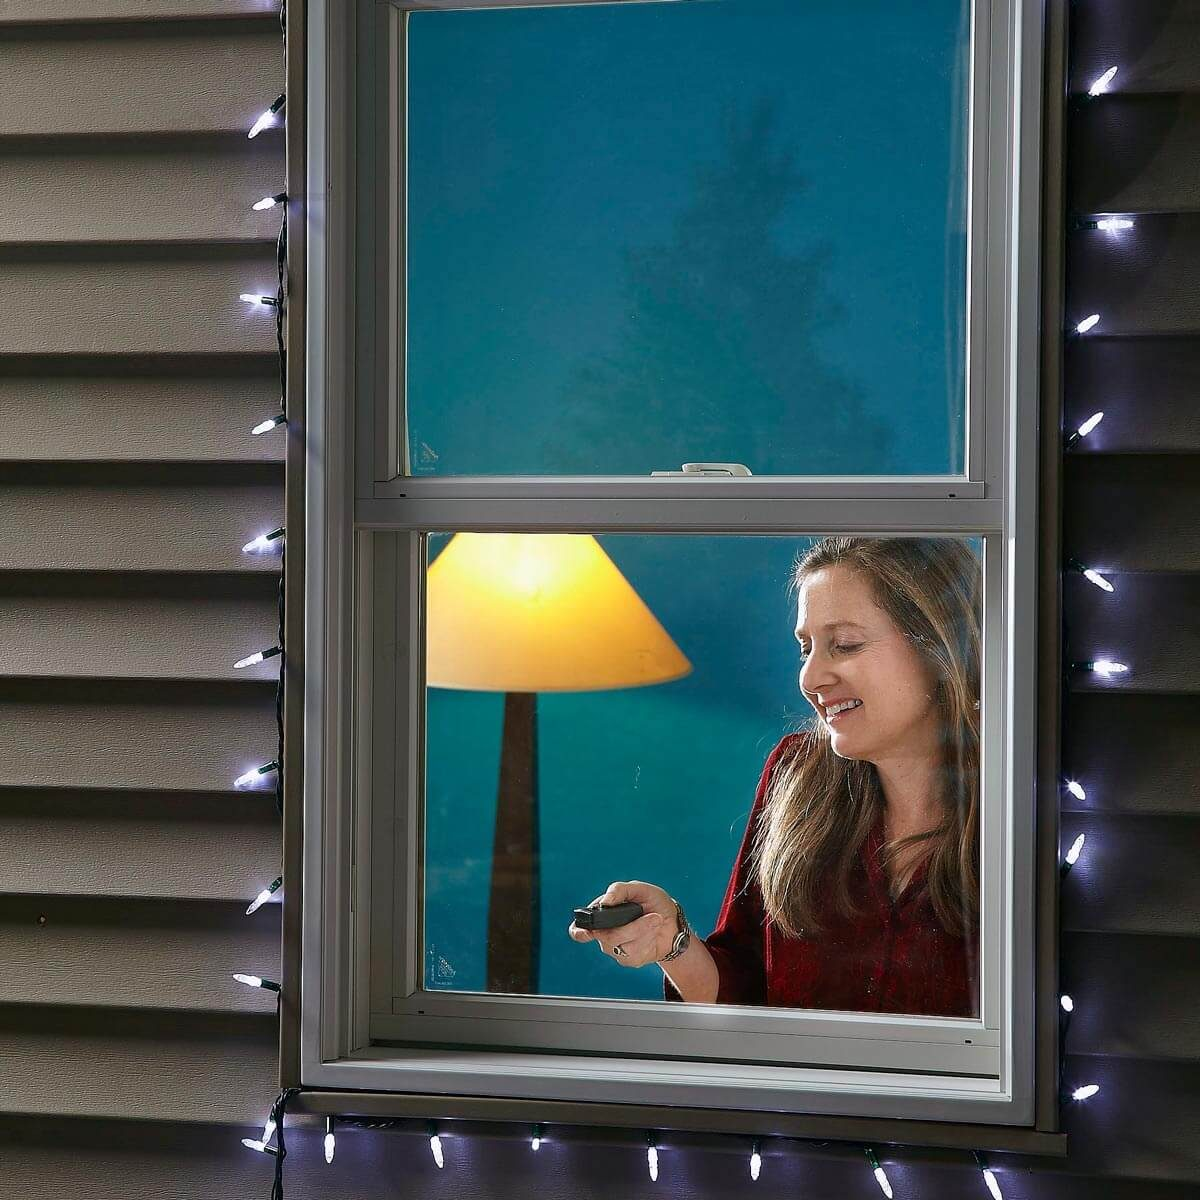 Easy outside light control